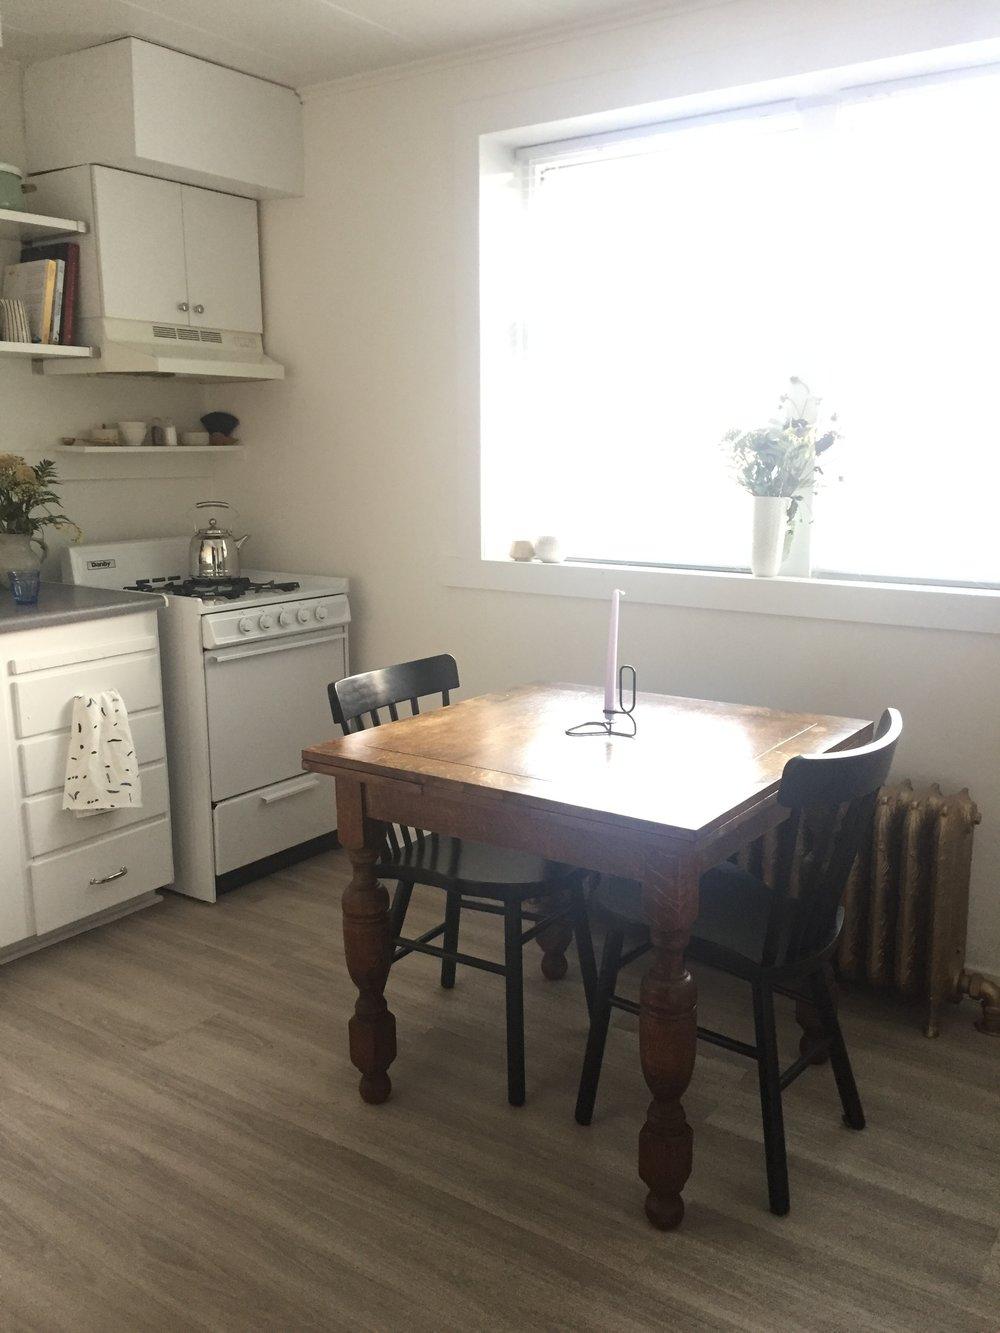 KendraMurphy-Kitchen-Before4.JPG